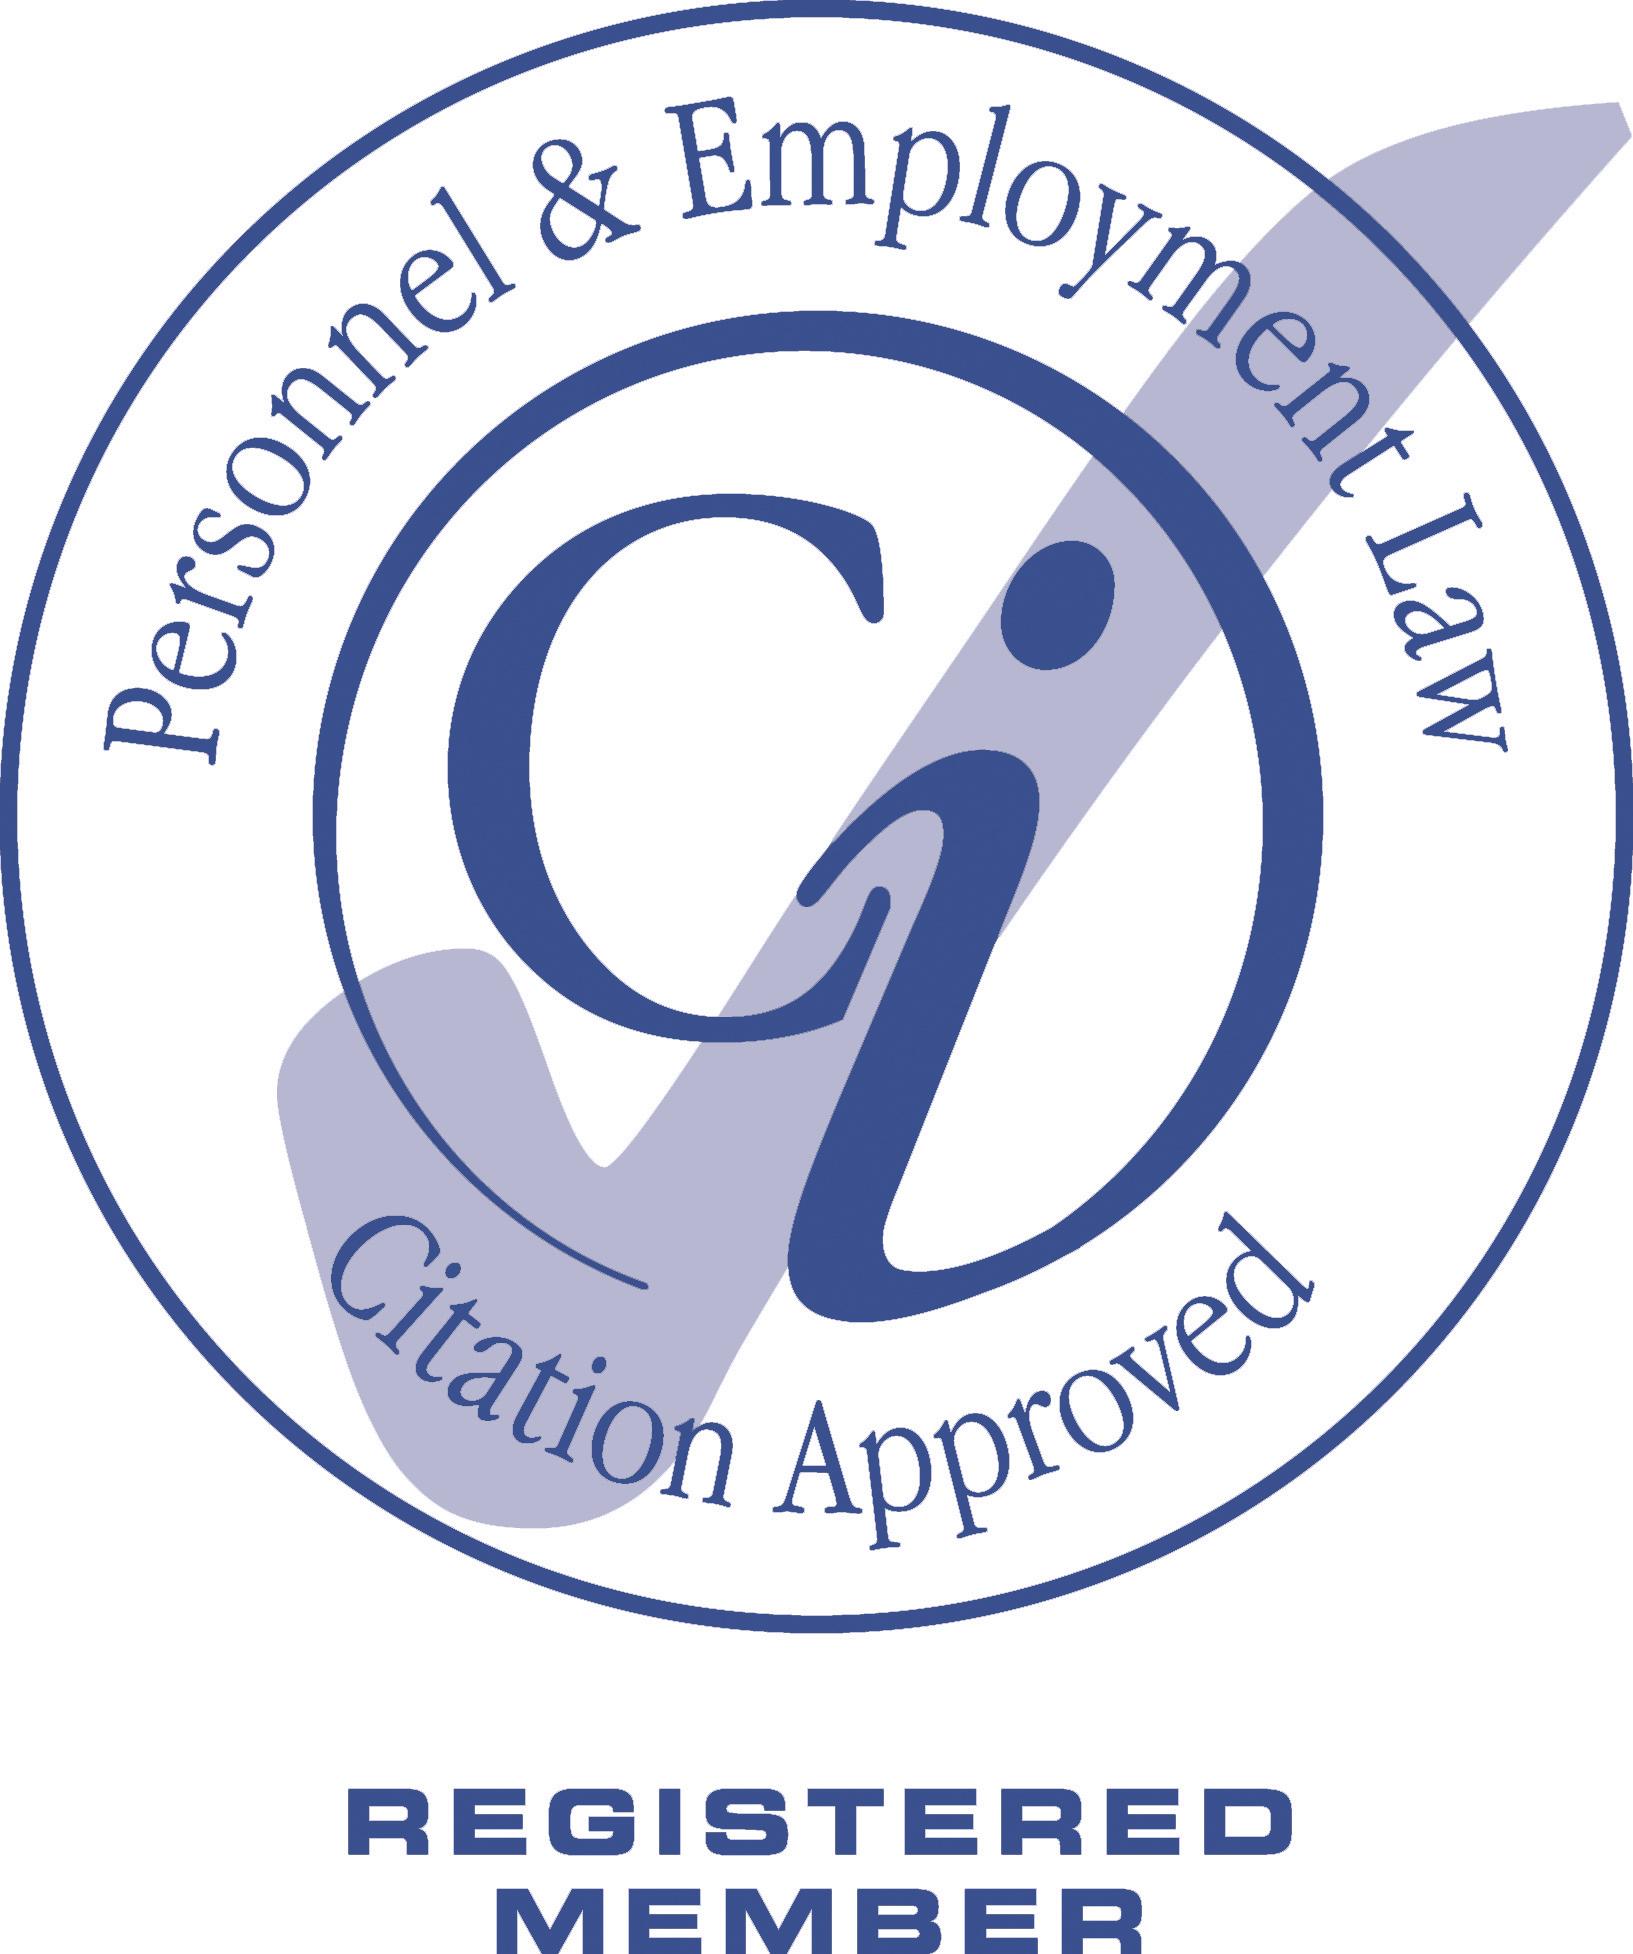 Citation logo.jpg